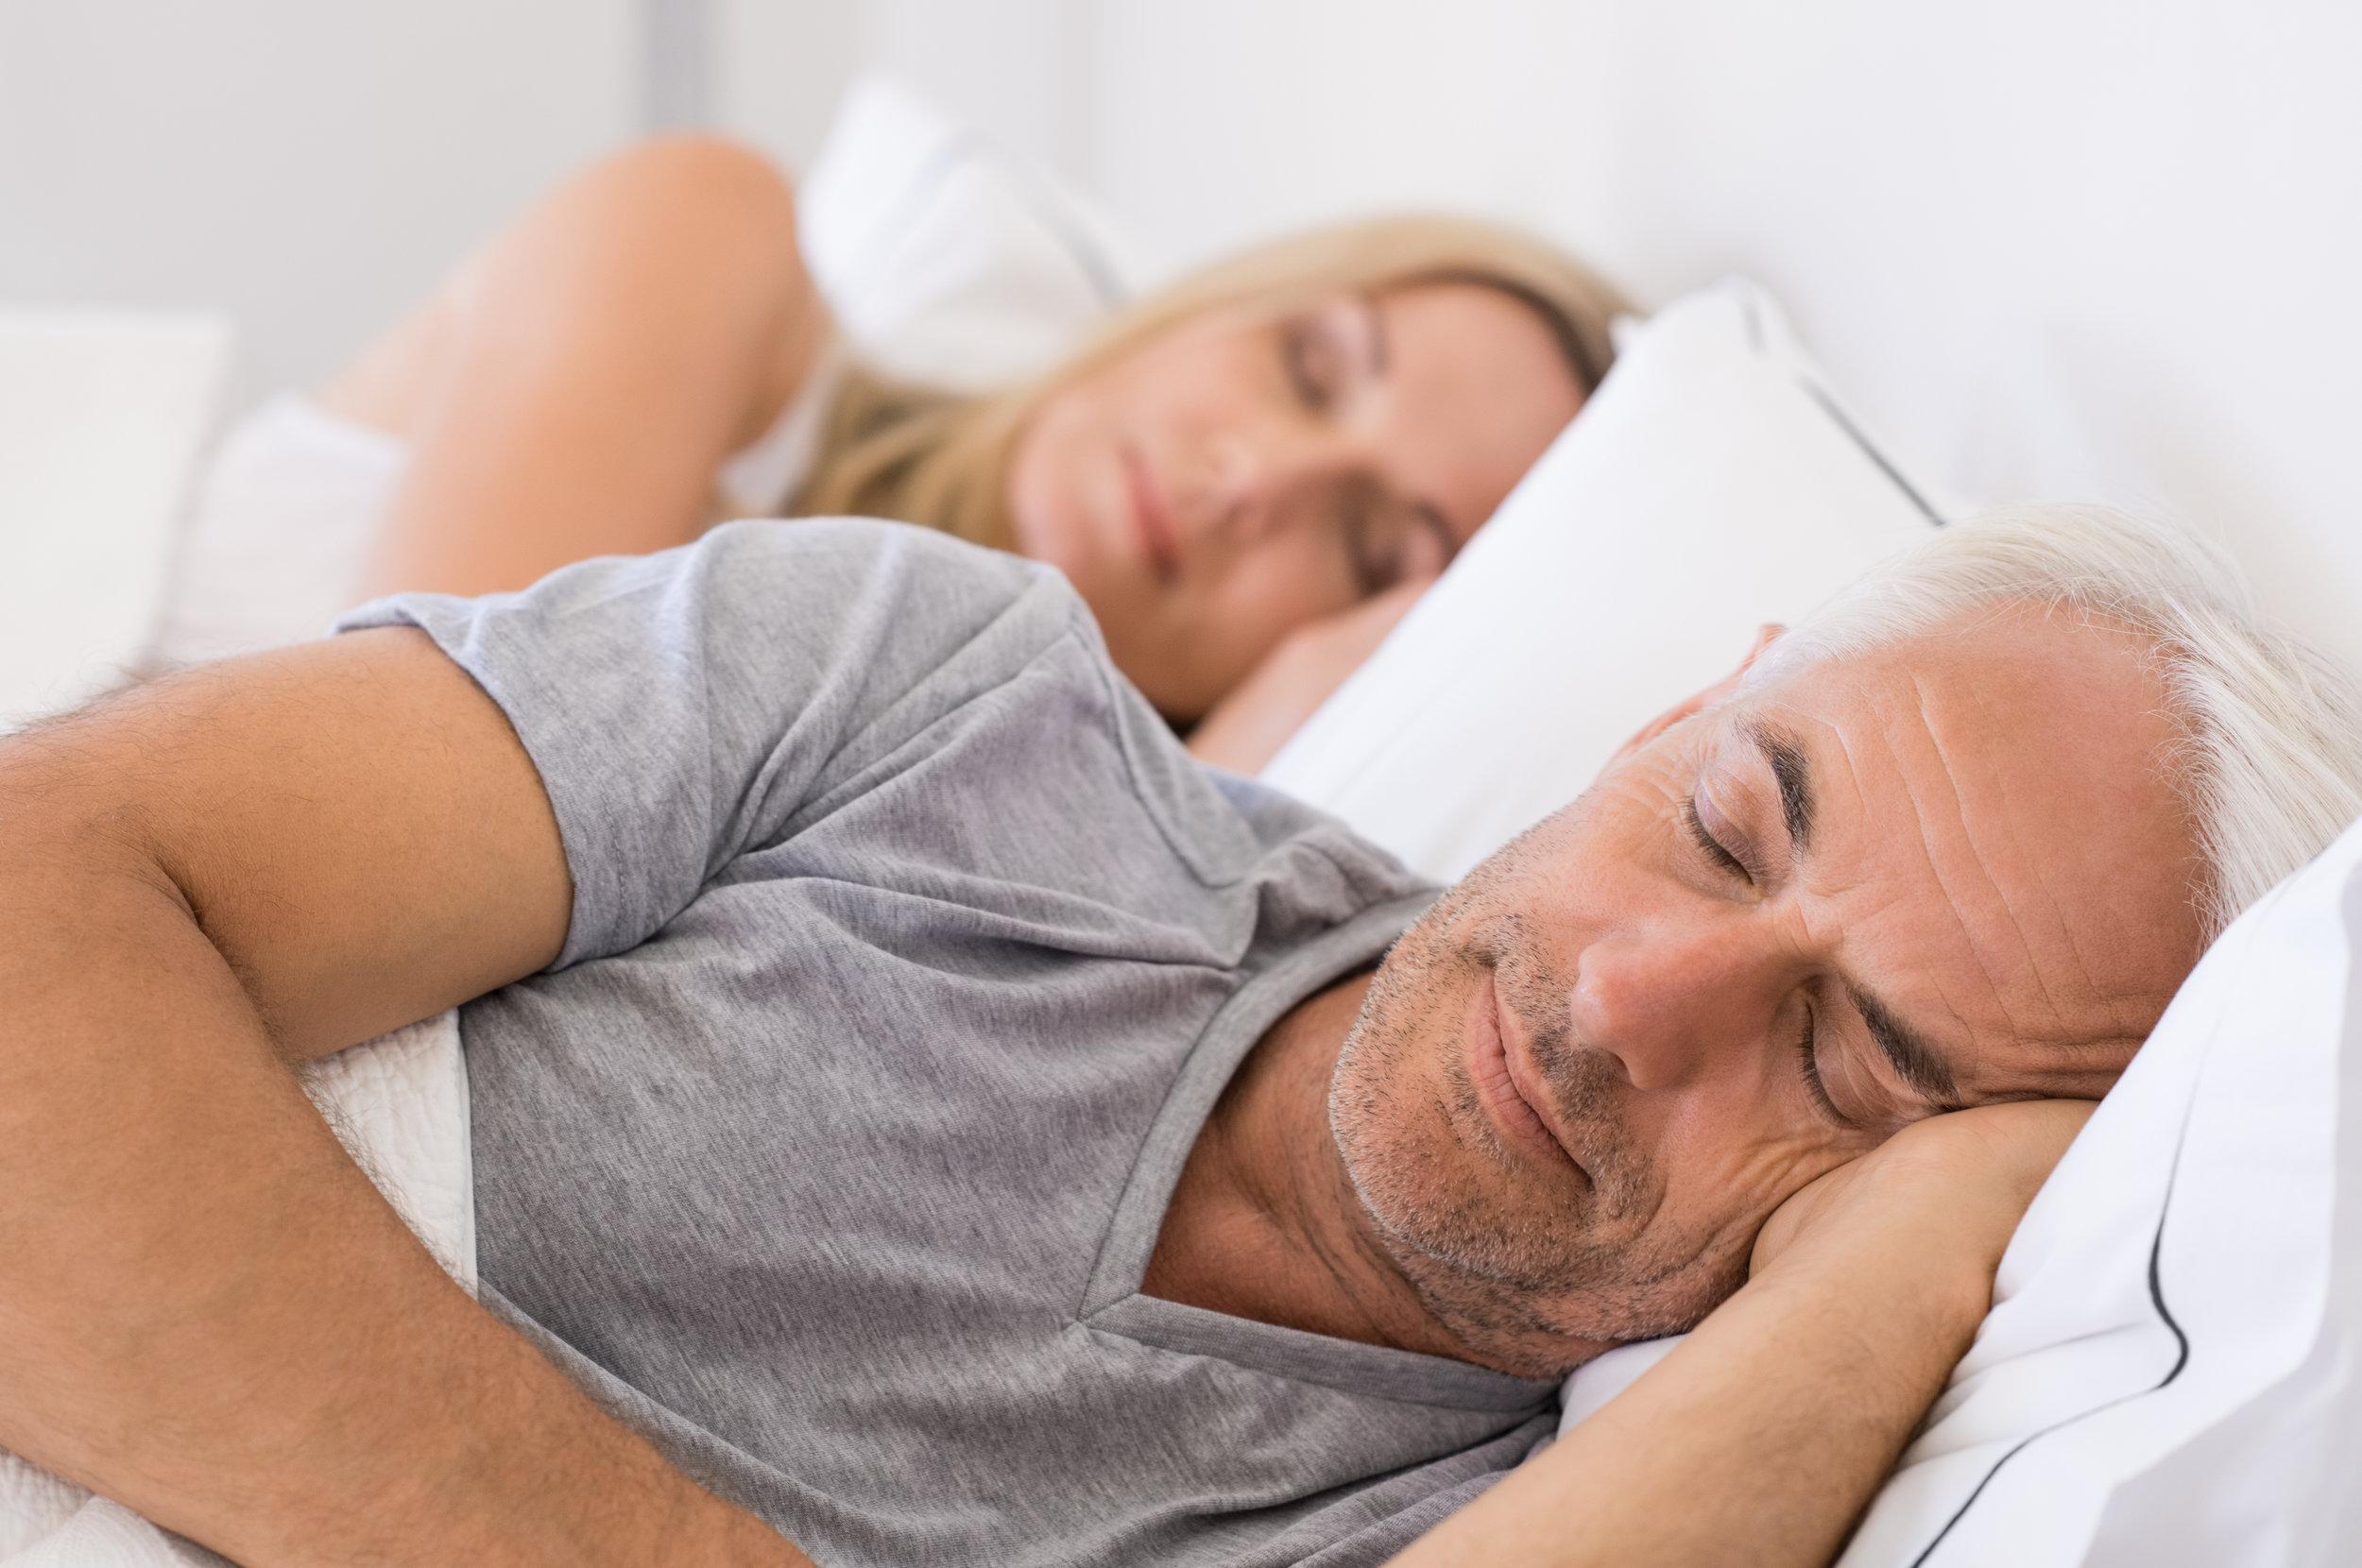 bigstock-Senior-man-and-woman-sleeping--133364783.jpg